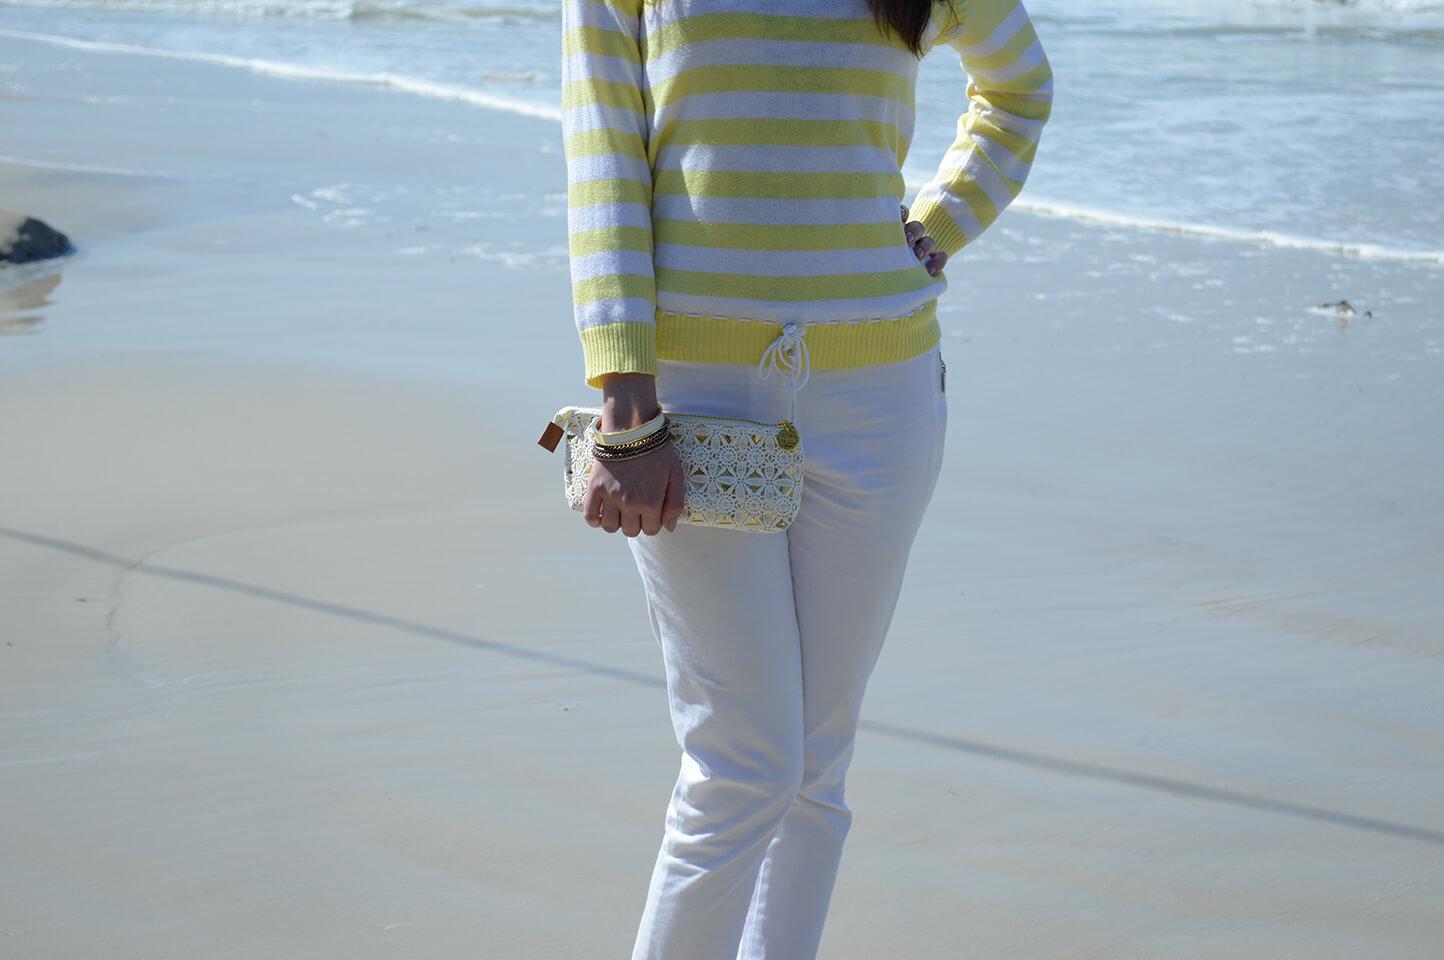 Detalhes: Look do dia na praia